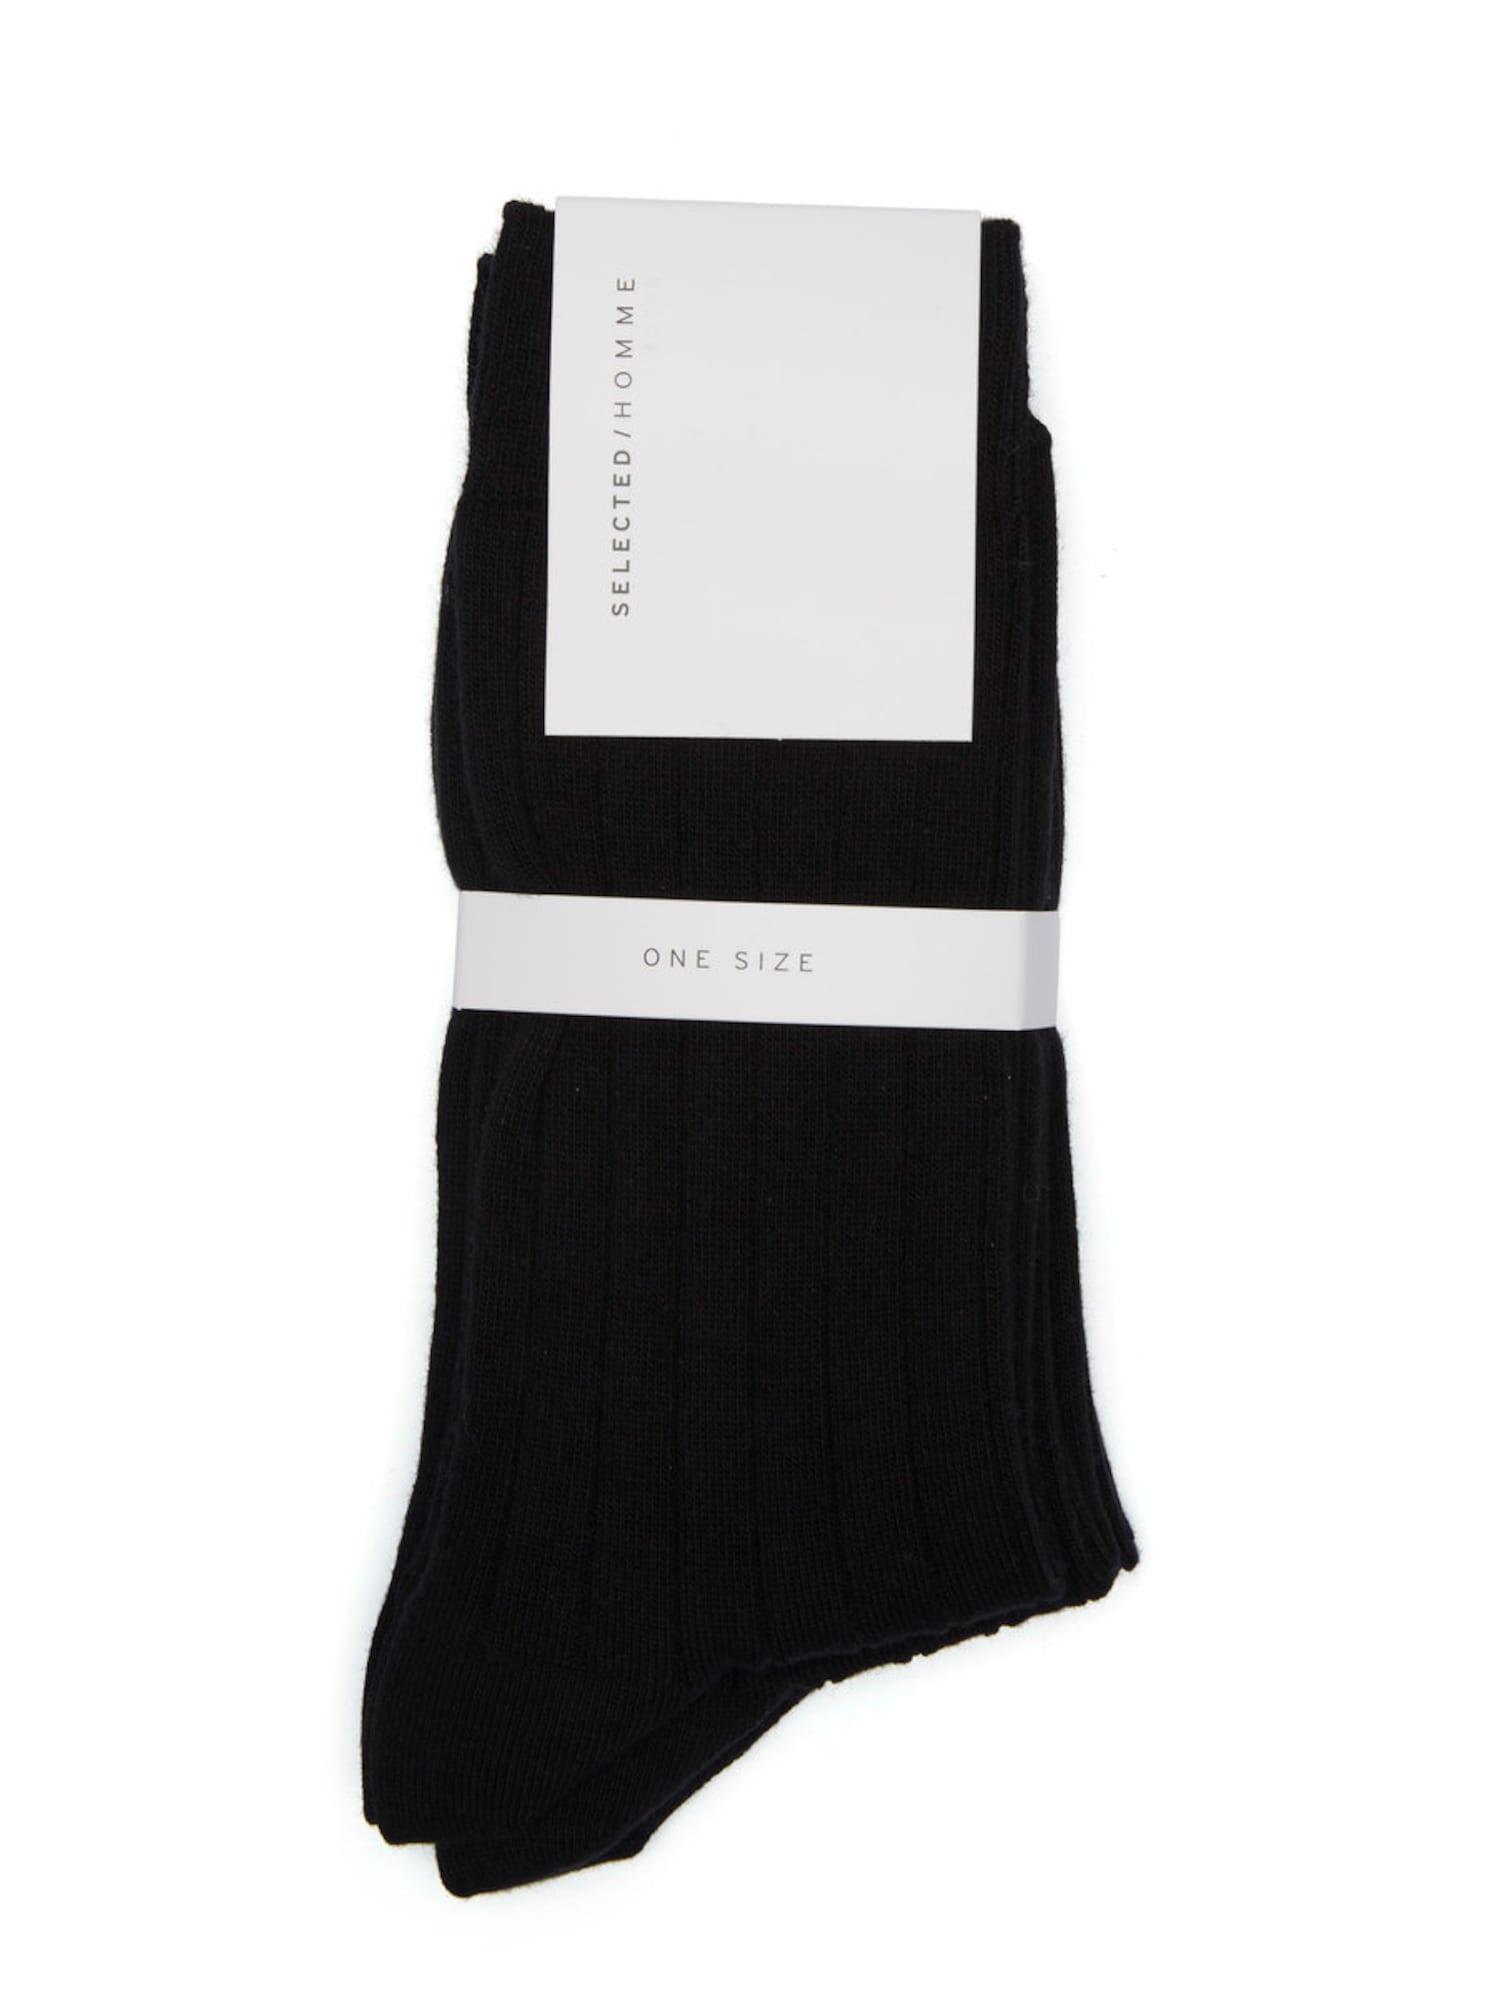 2 Paar Sympatico Herren Business Socken 98% Baumwolle Kurzsocken